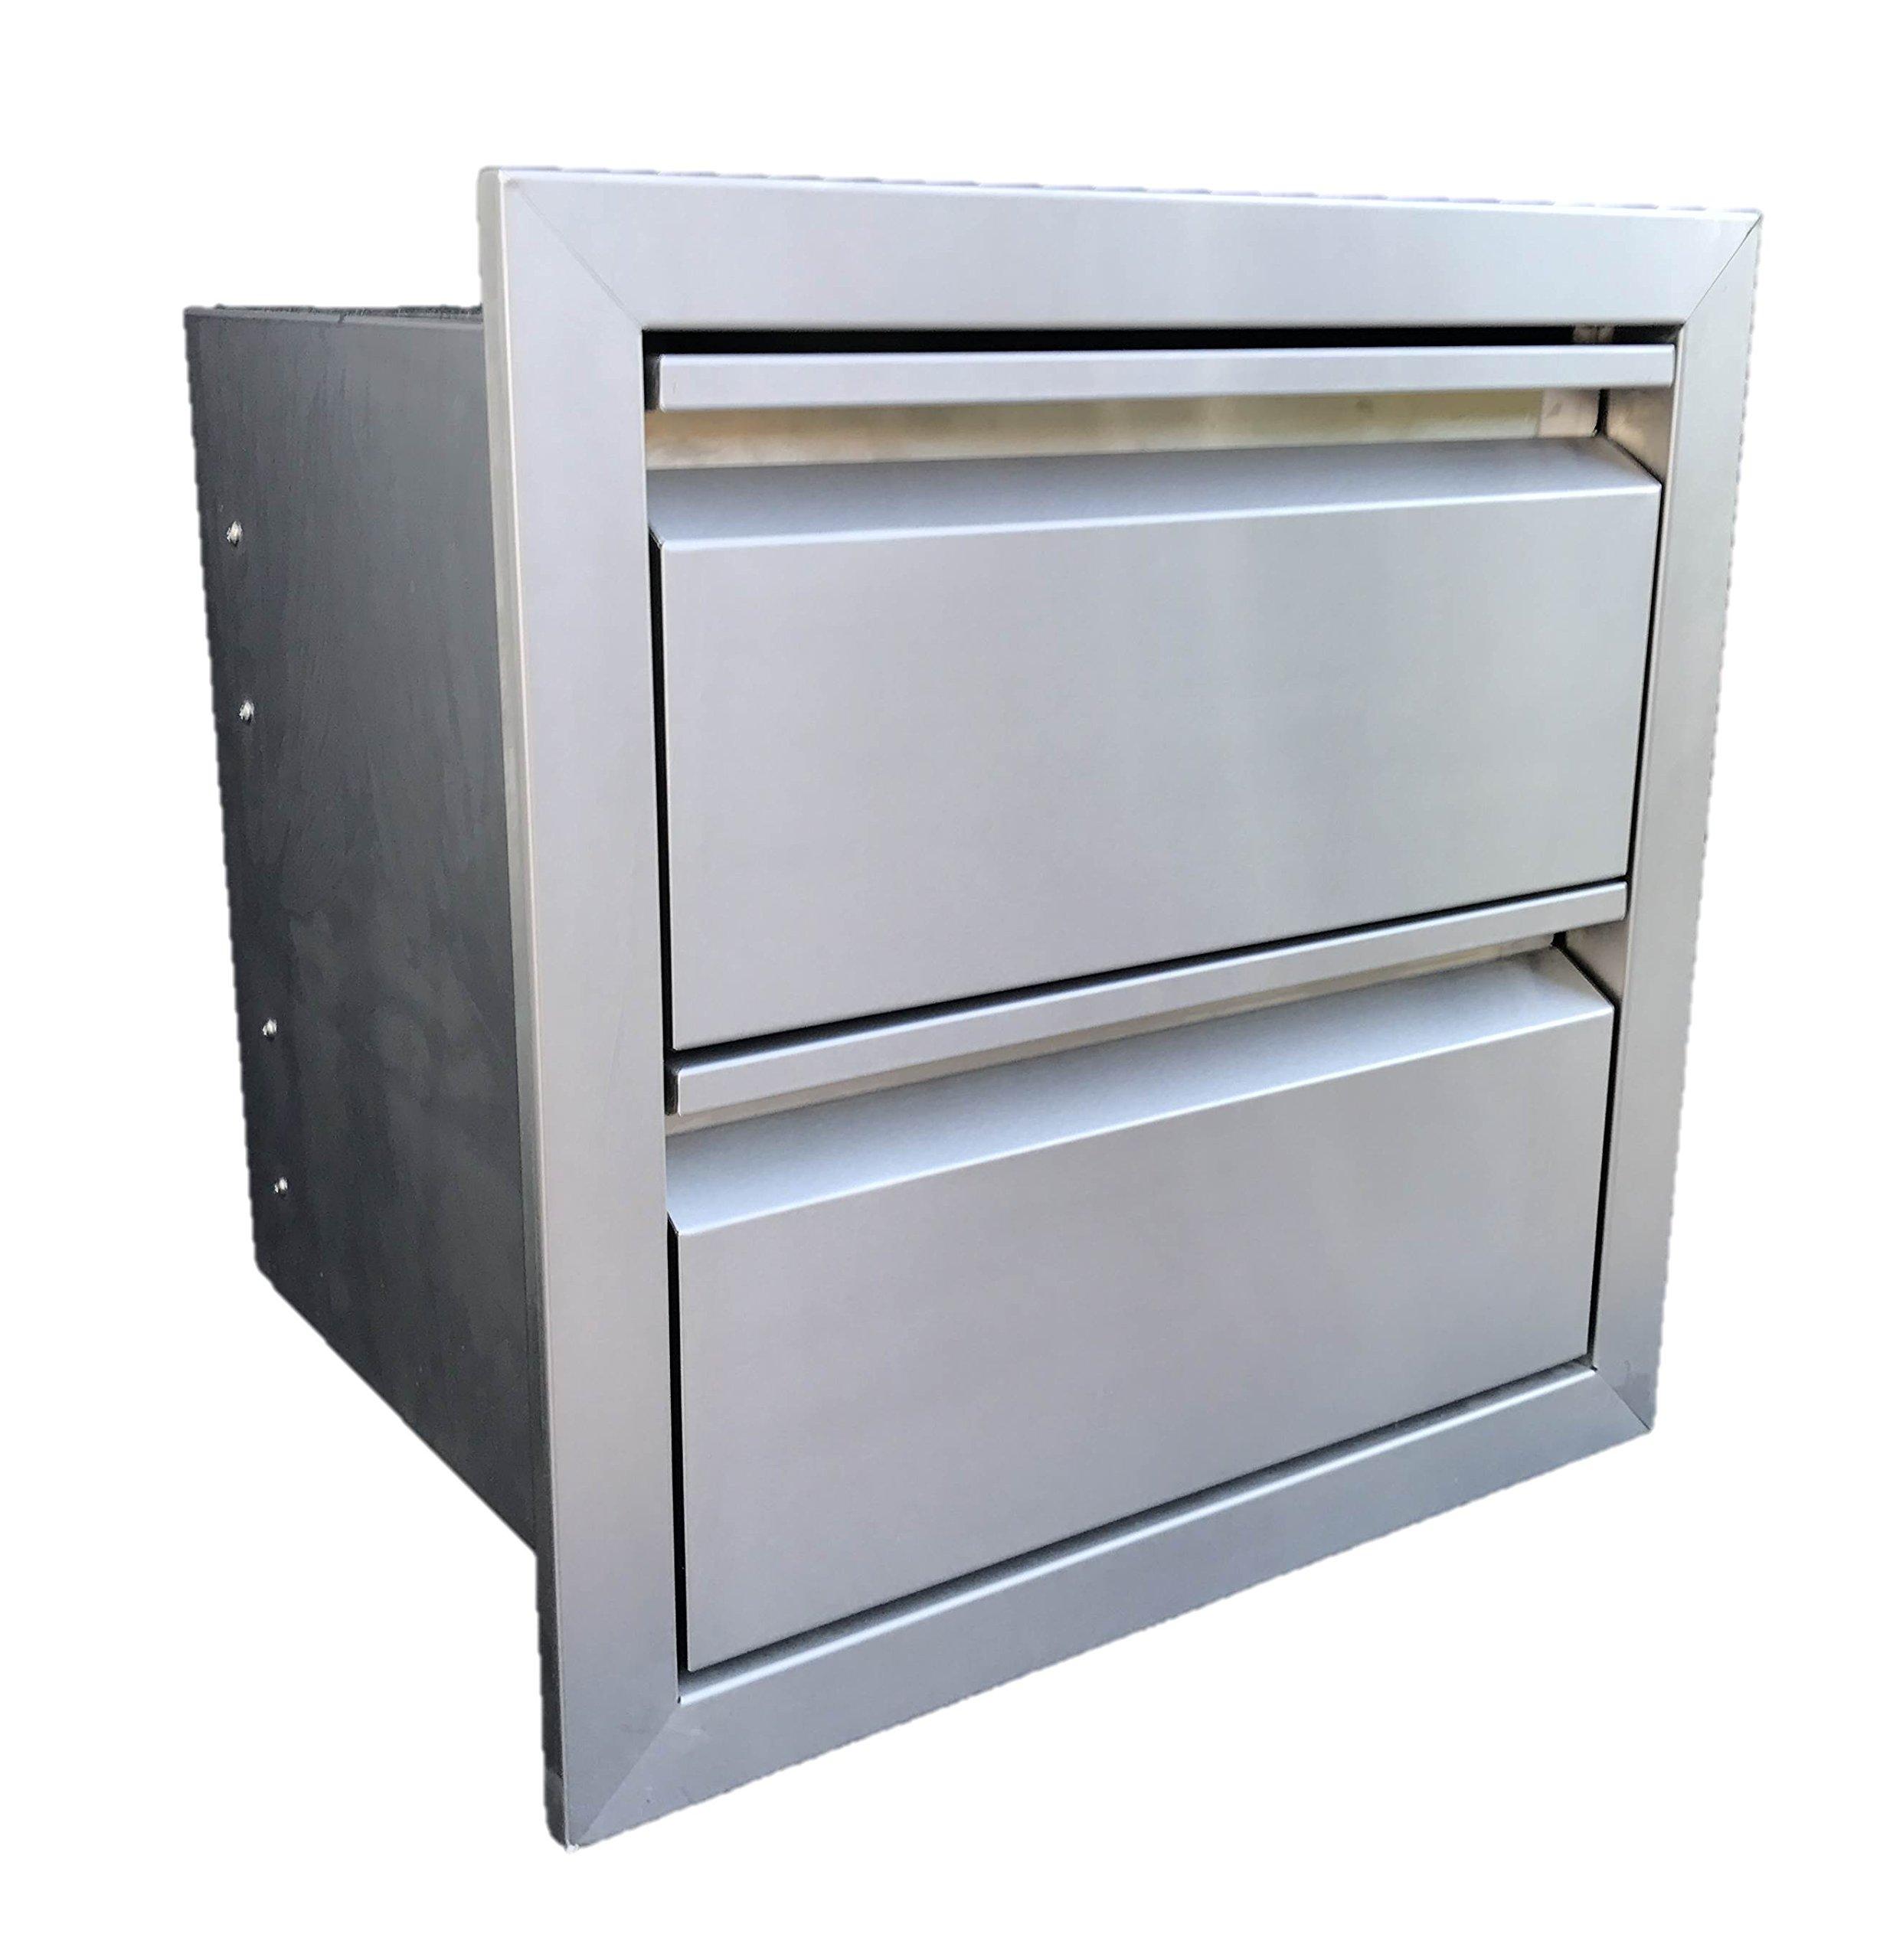 19'' W x 19'' H Double Access Drawer Outdoor Kitchen BBQ Island 304 Stainless Steel Storage